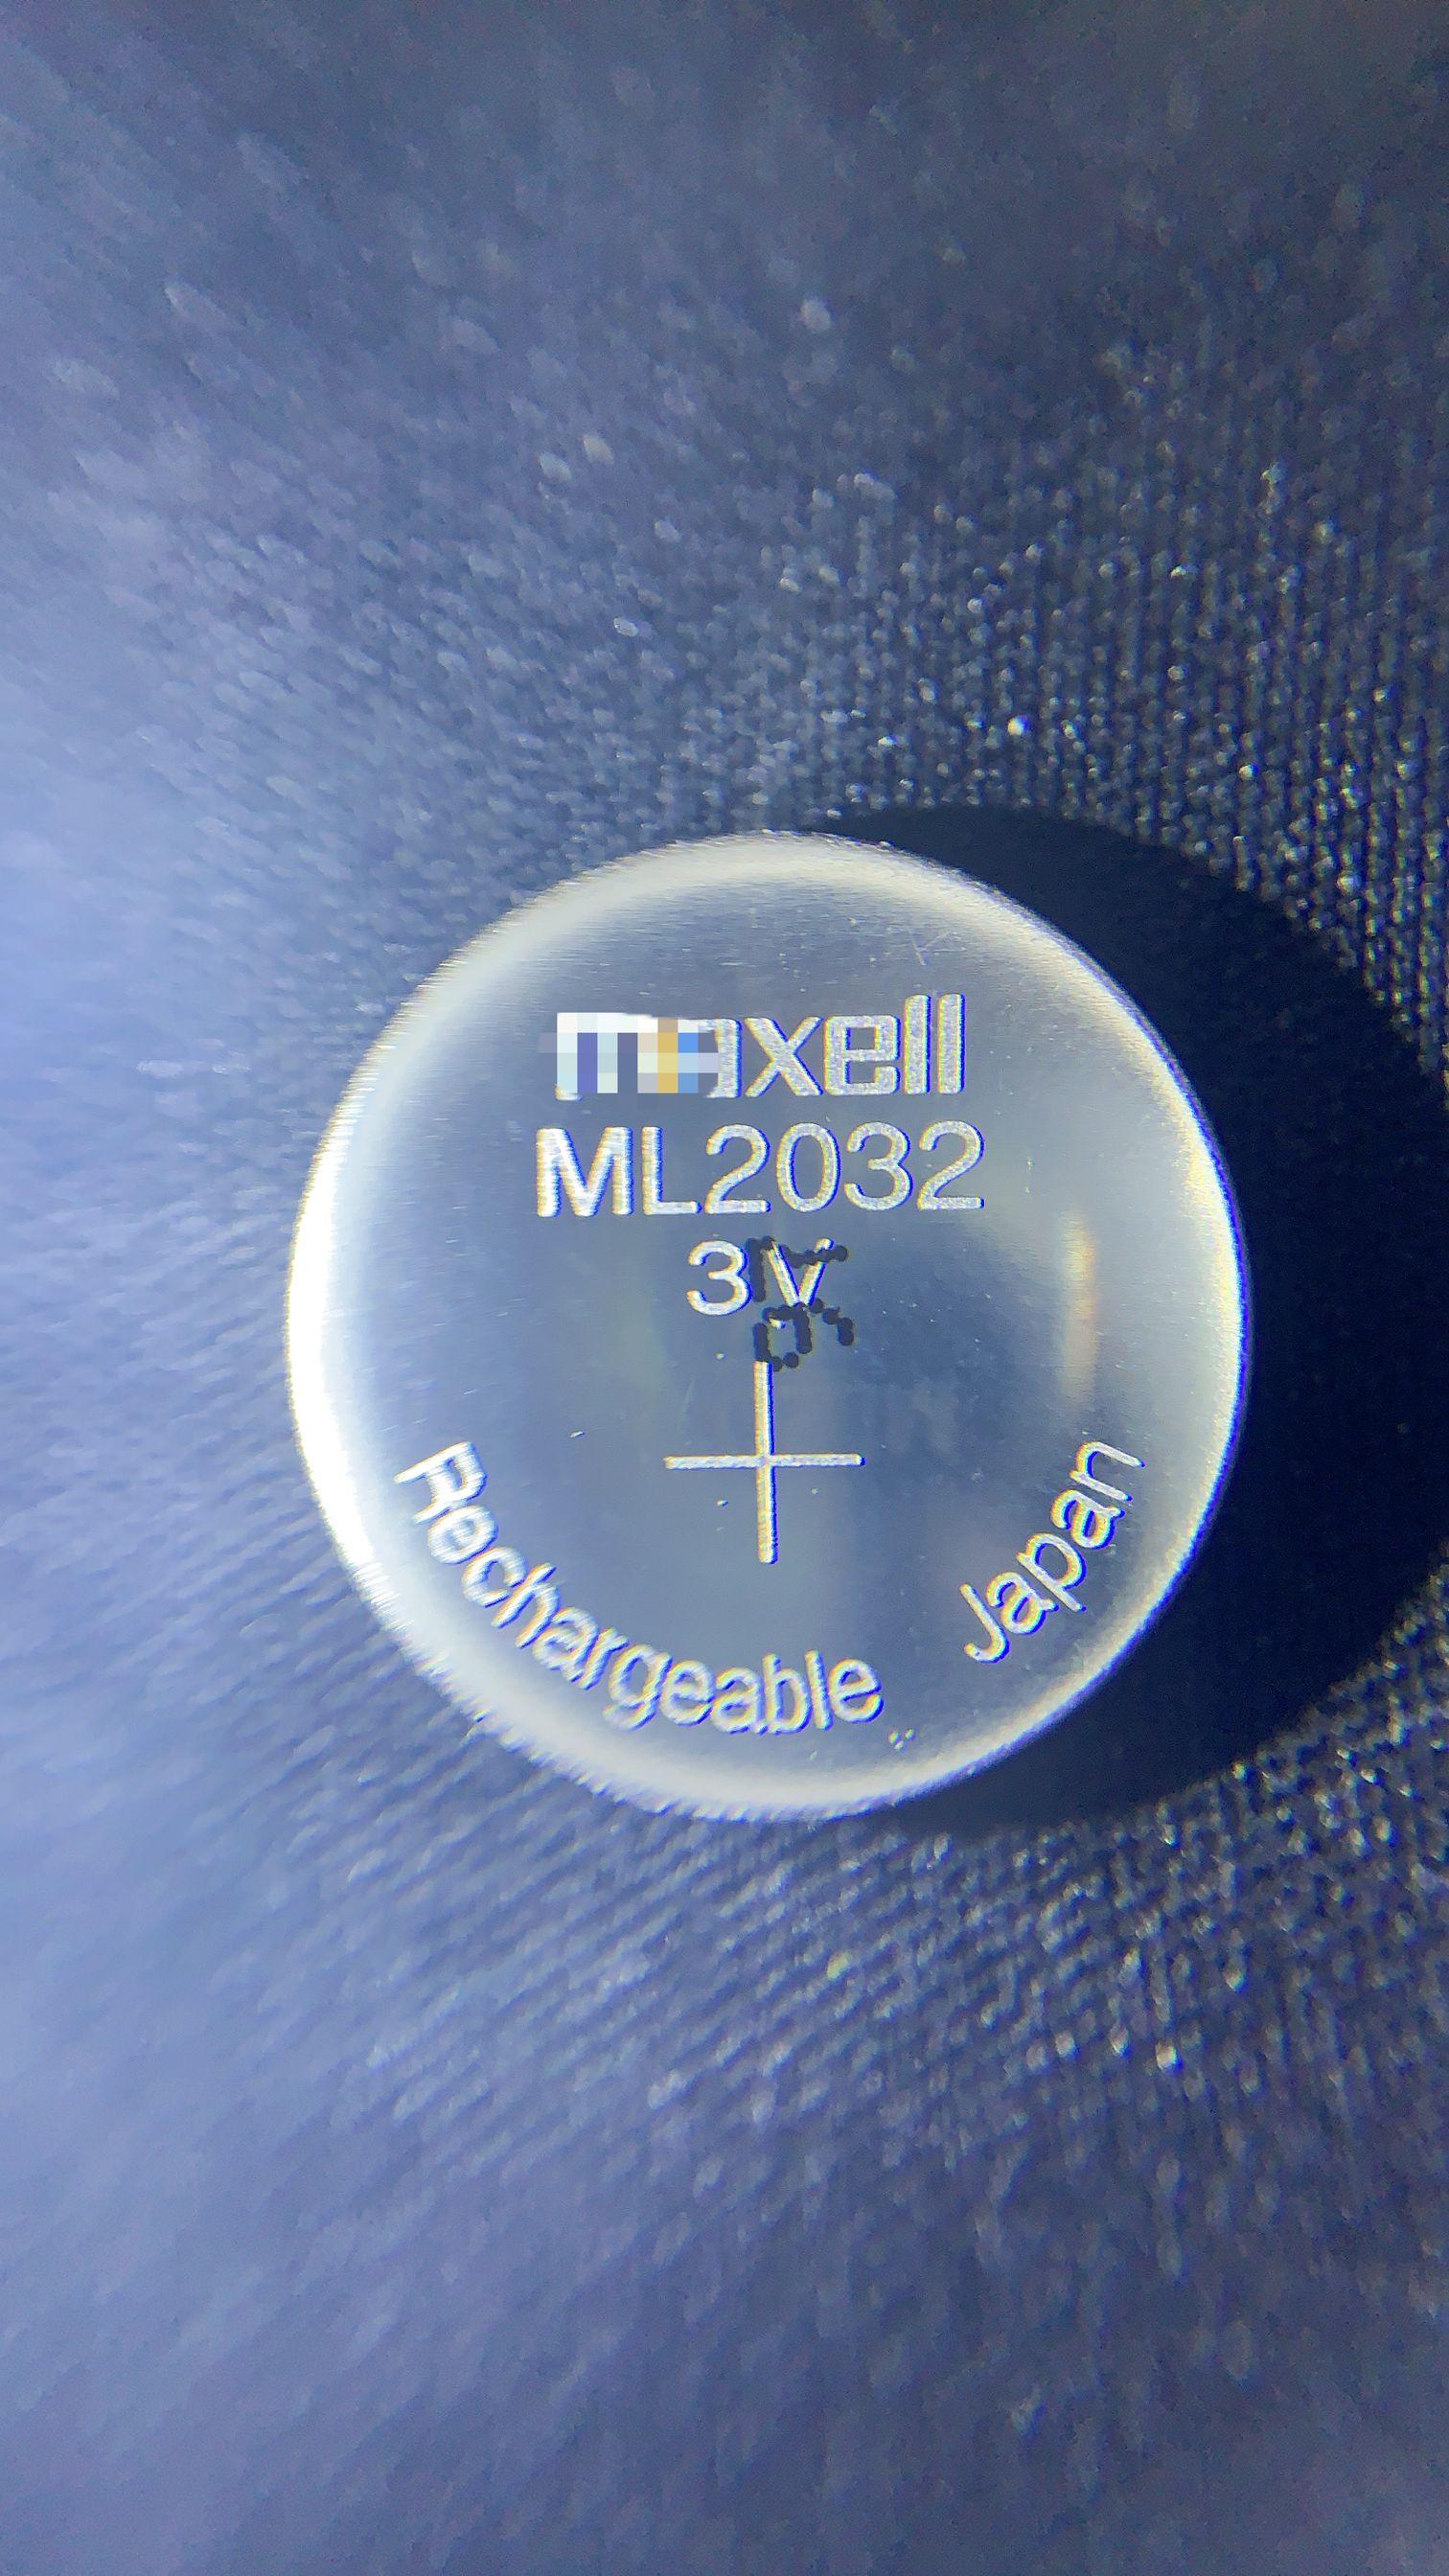 2 ~ 10 قطعة/الوحدة جديد الأصلي ماكسيل ml2032 3 v ricaricabile ديلي cellule ديل tasto batteria al litio بطاريات a bottone (ml2032)